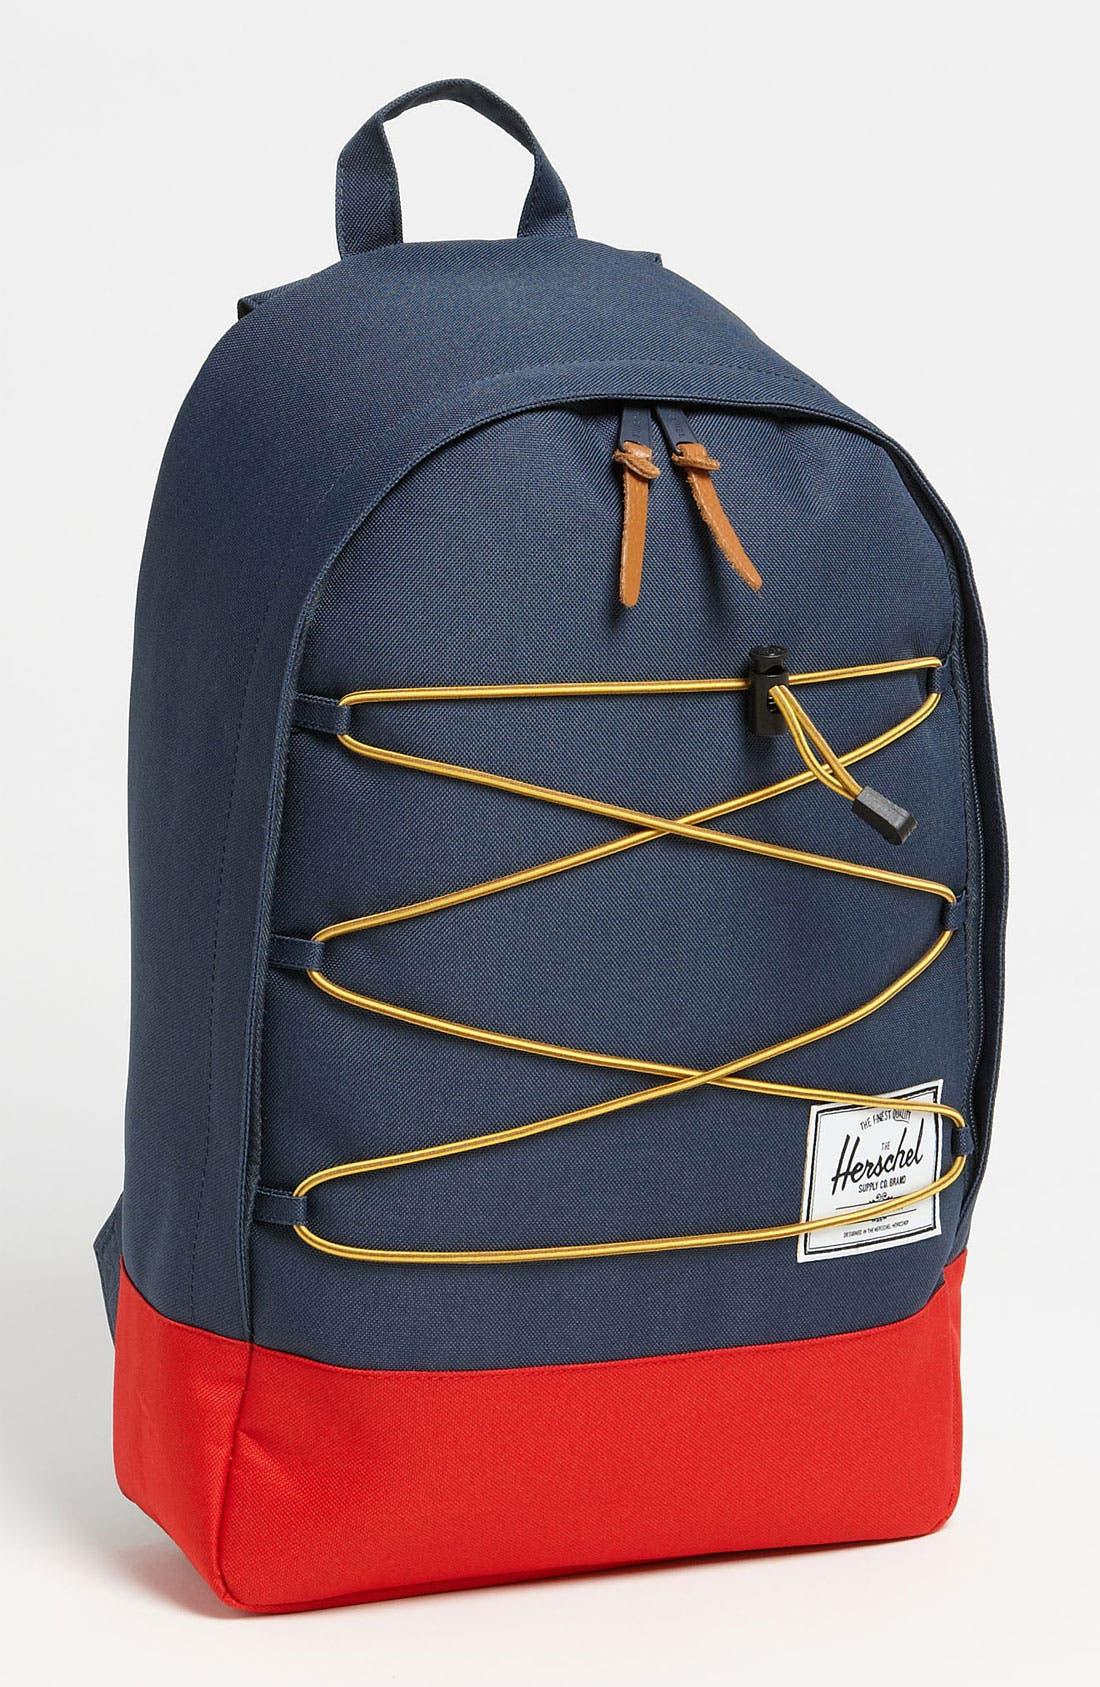 Alternate Image 1 Selected - Herschel Supply Co. 'Quarry' Backpack